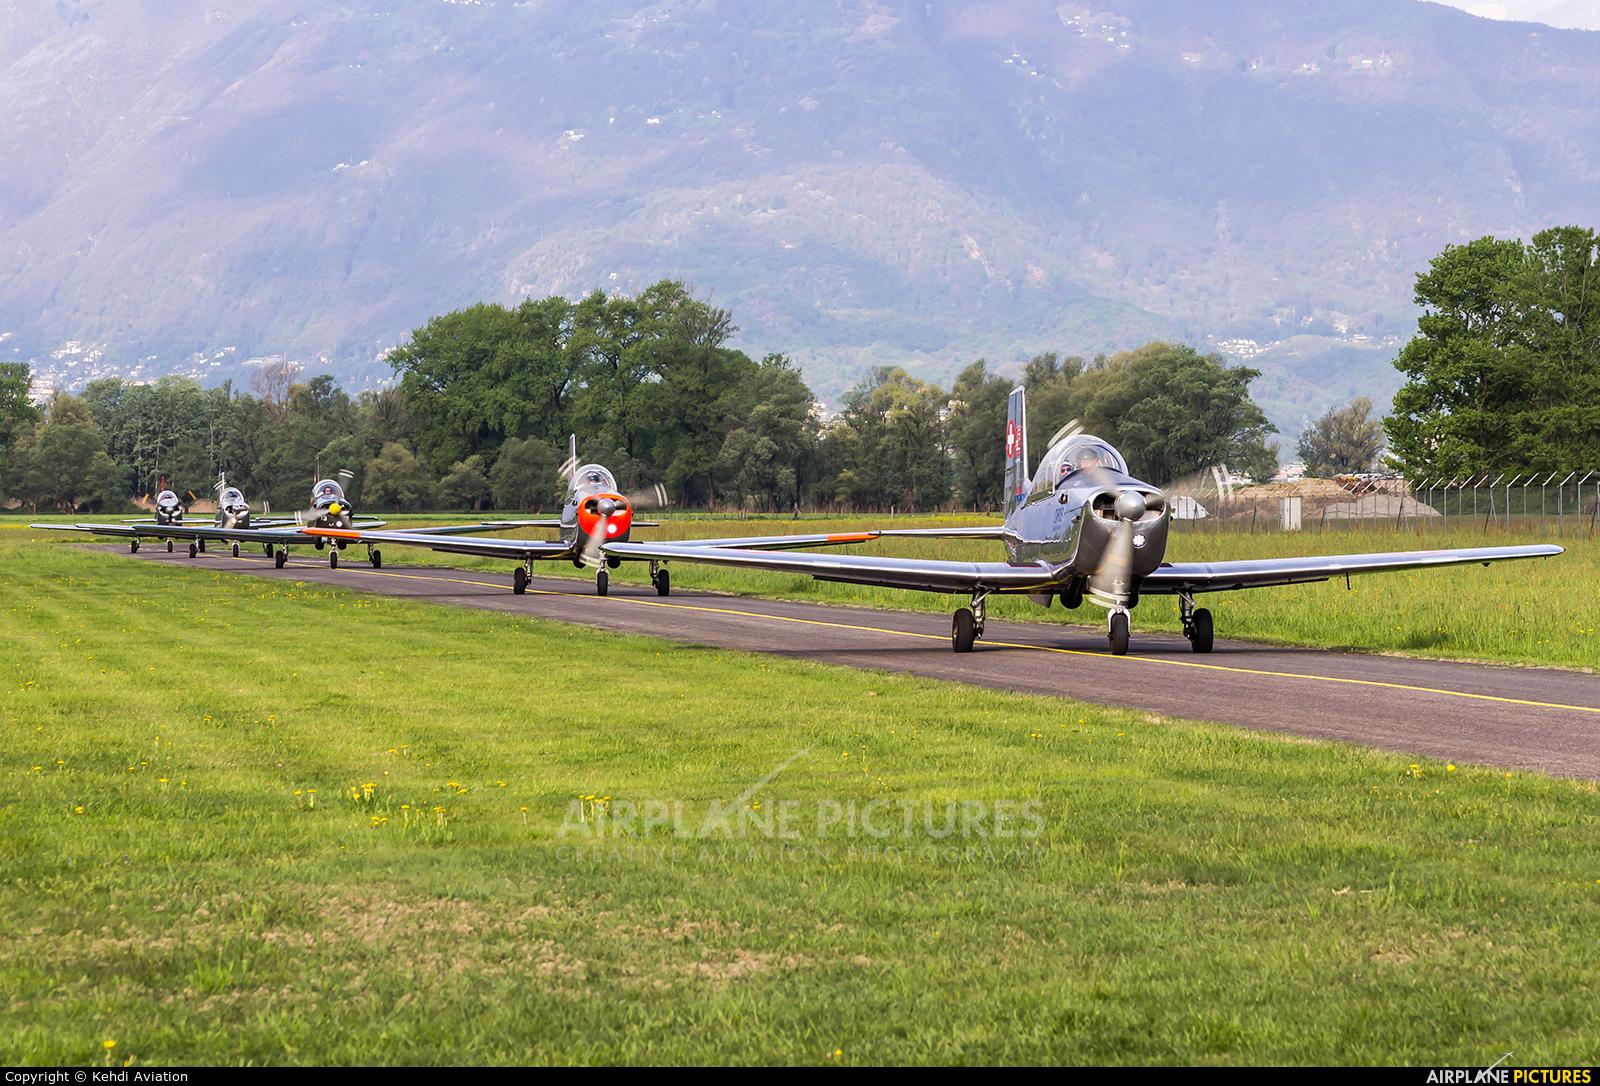 P3 Flyers Ticino - aircraft at Locarno